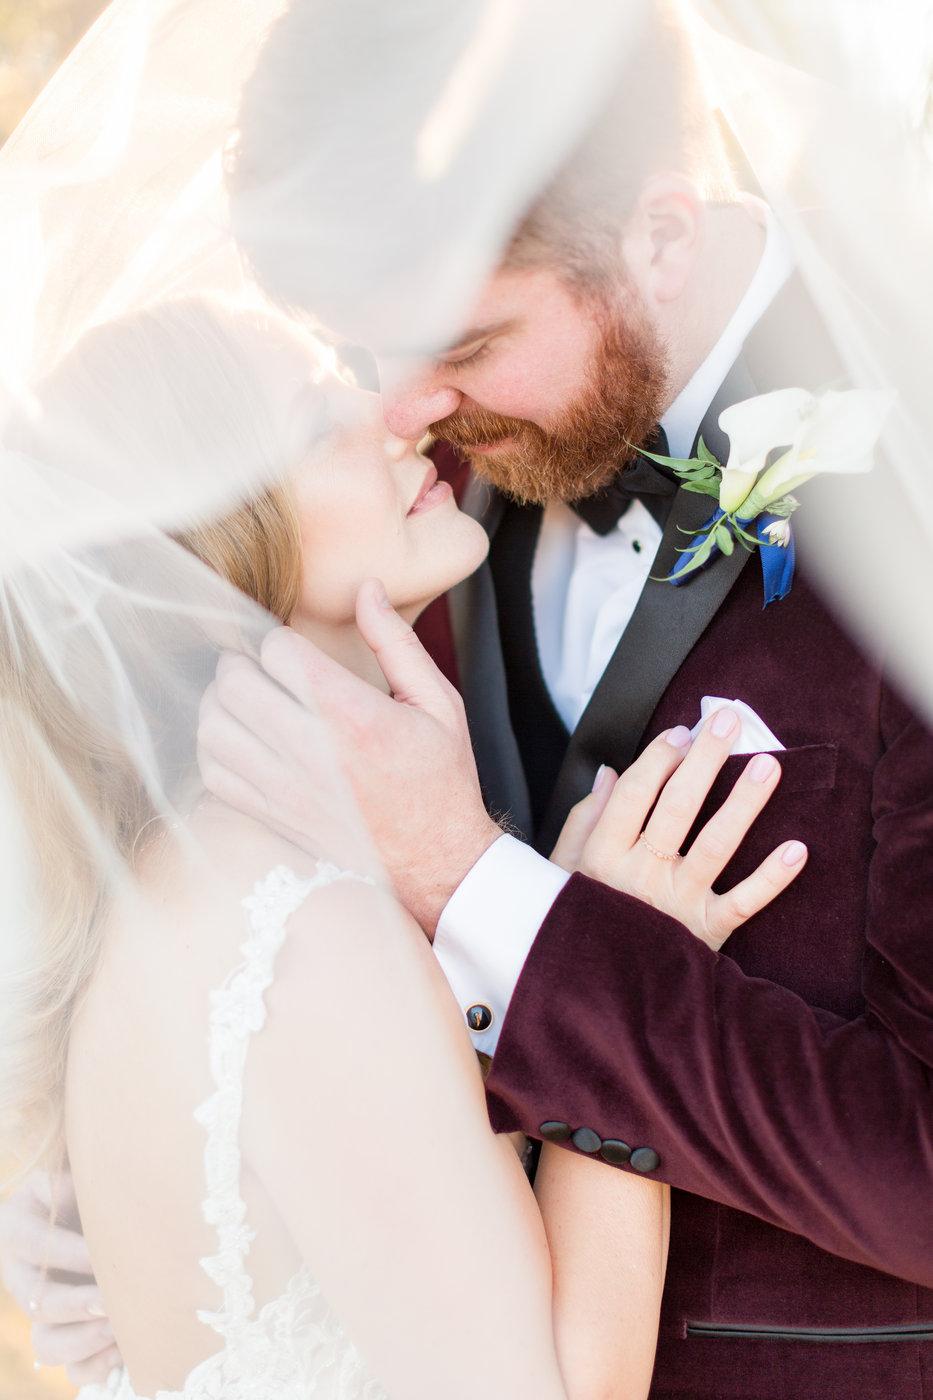 romantic-wedding-photos-with-brides-veil.jpg